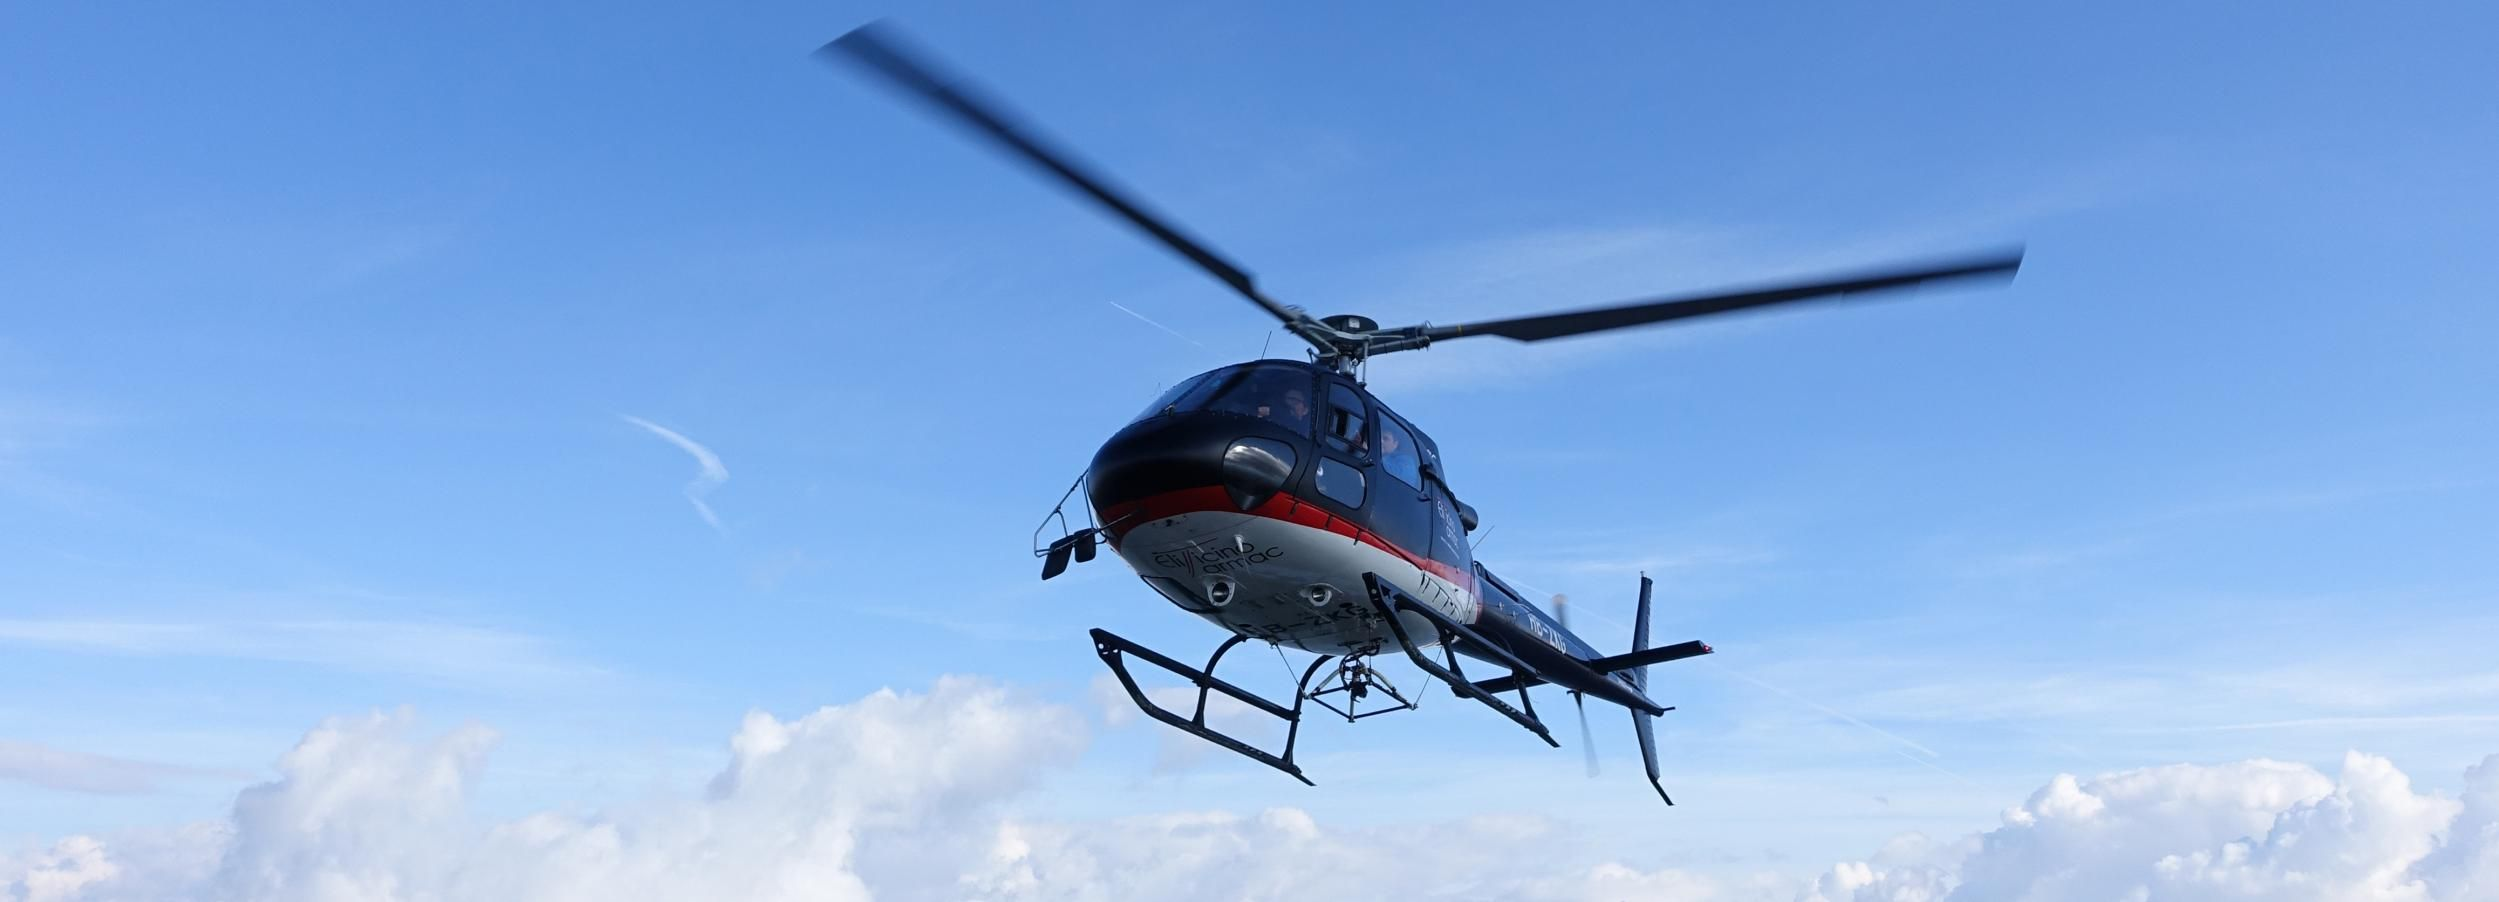 Bern: Privater 18-minütiger Hubschrauberflug